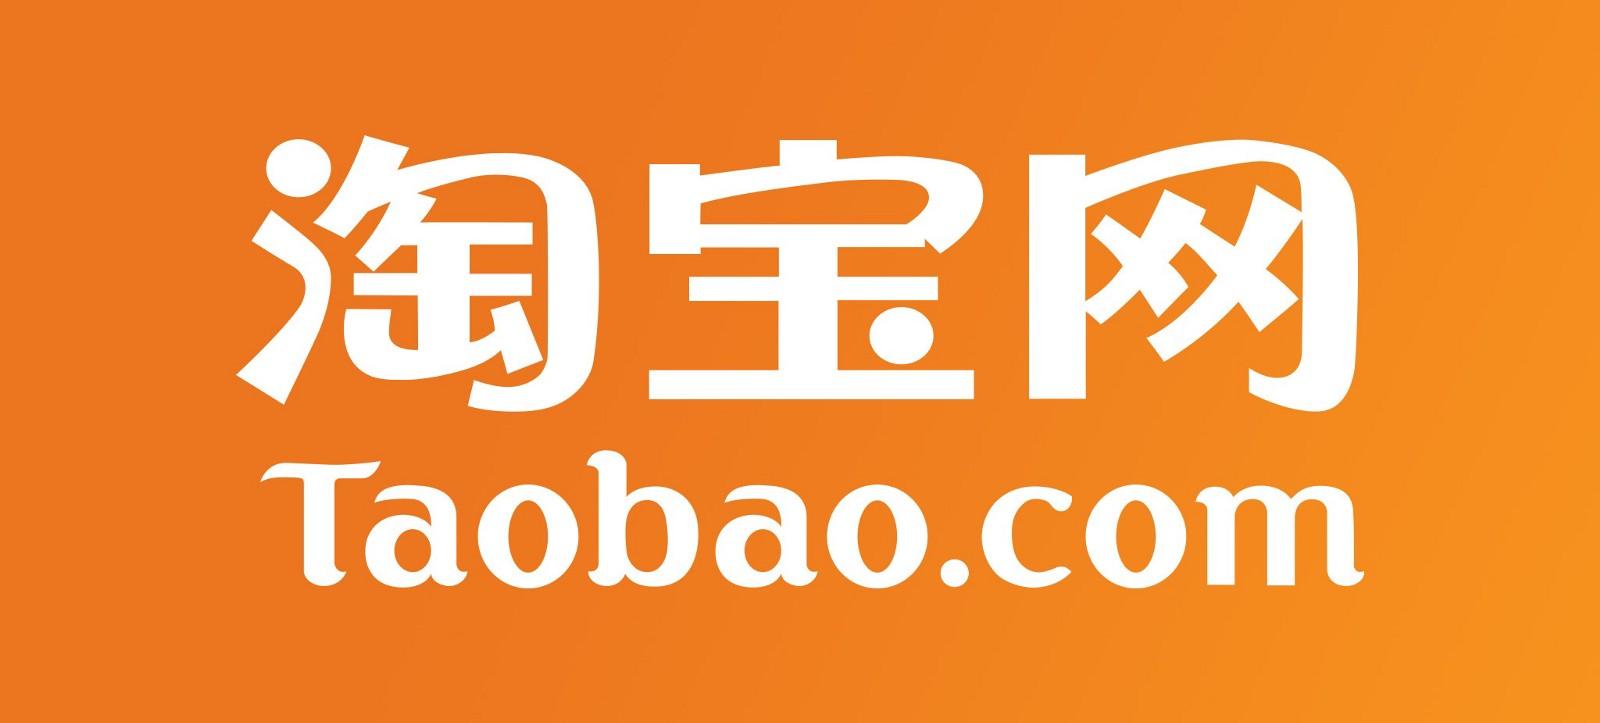 How to use my Taobao promo codes, Taobao coupons & Taobao deals to shop at Taobao UAE & Taobao Dubai?